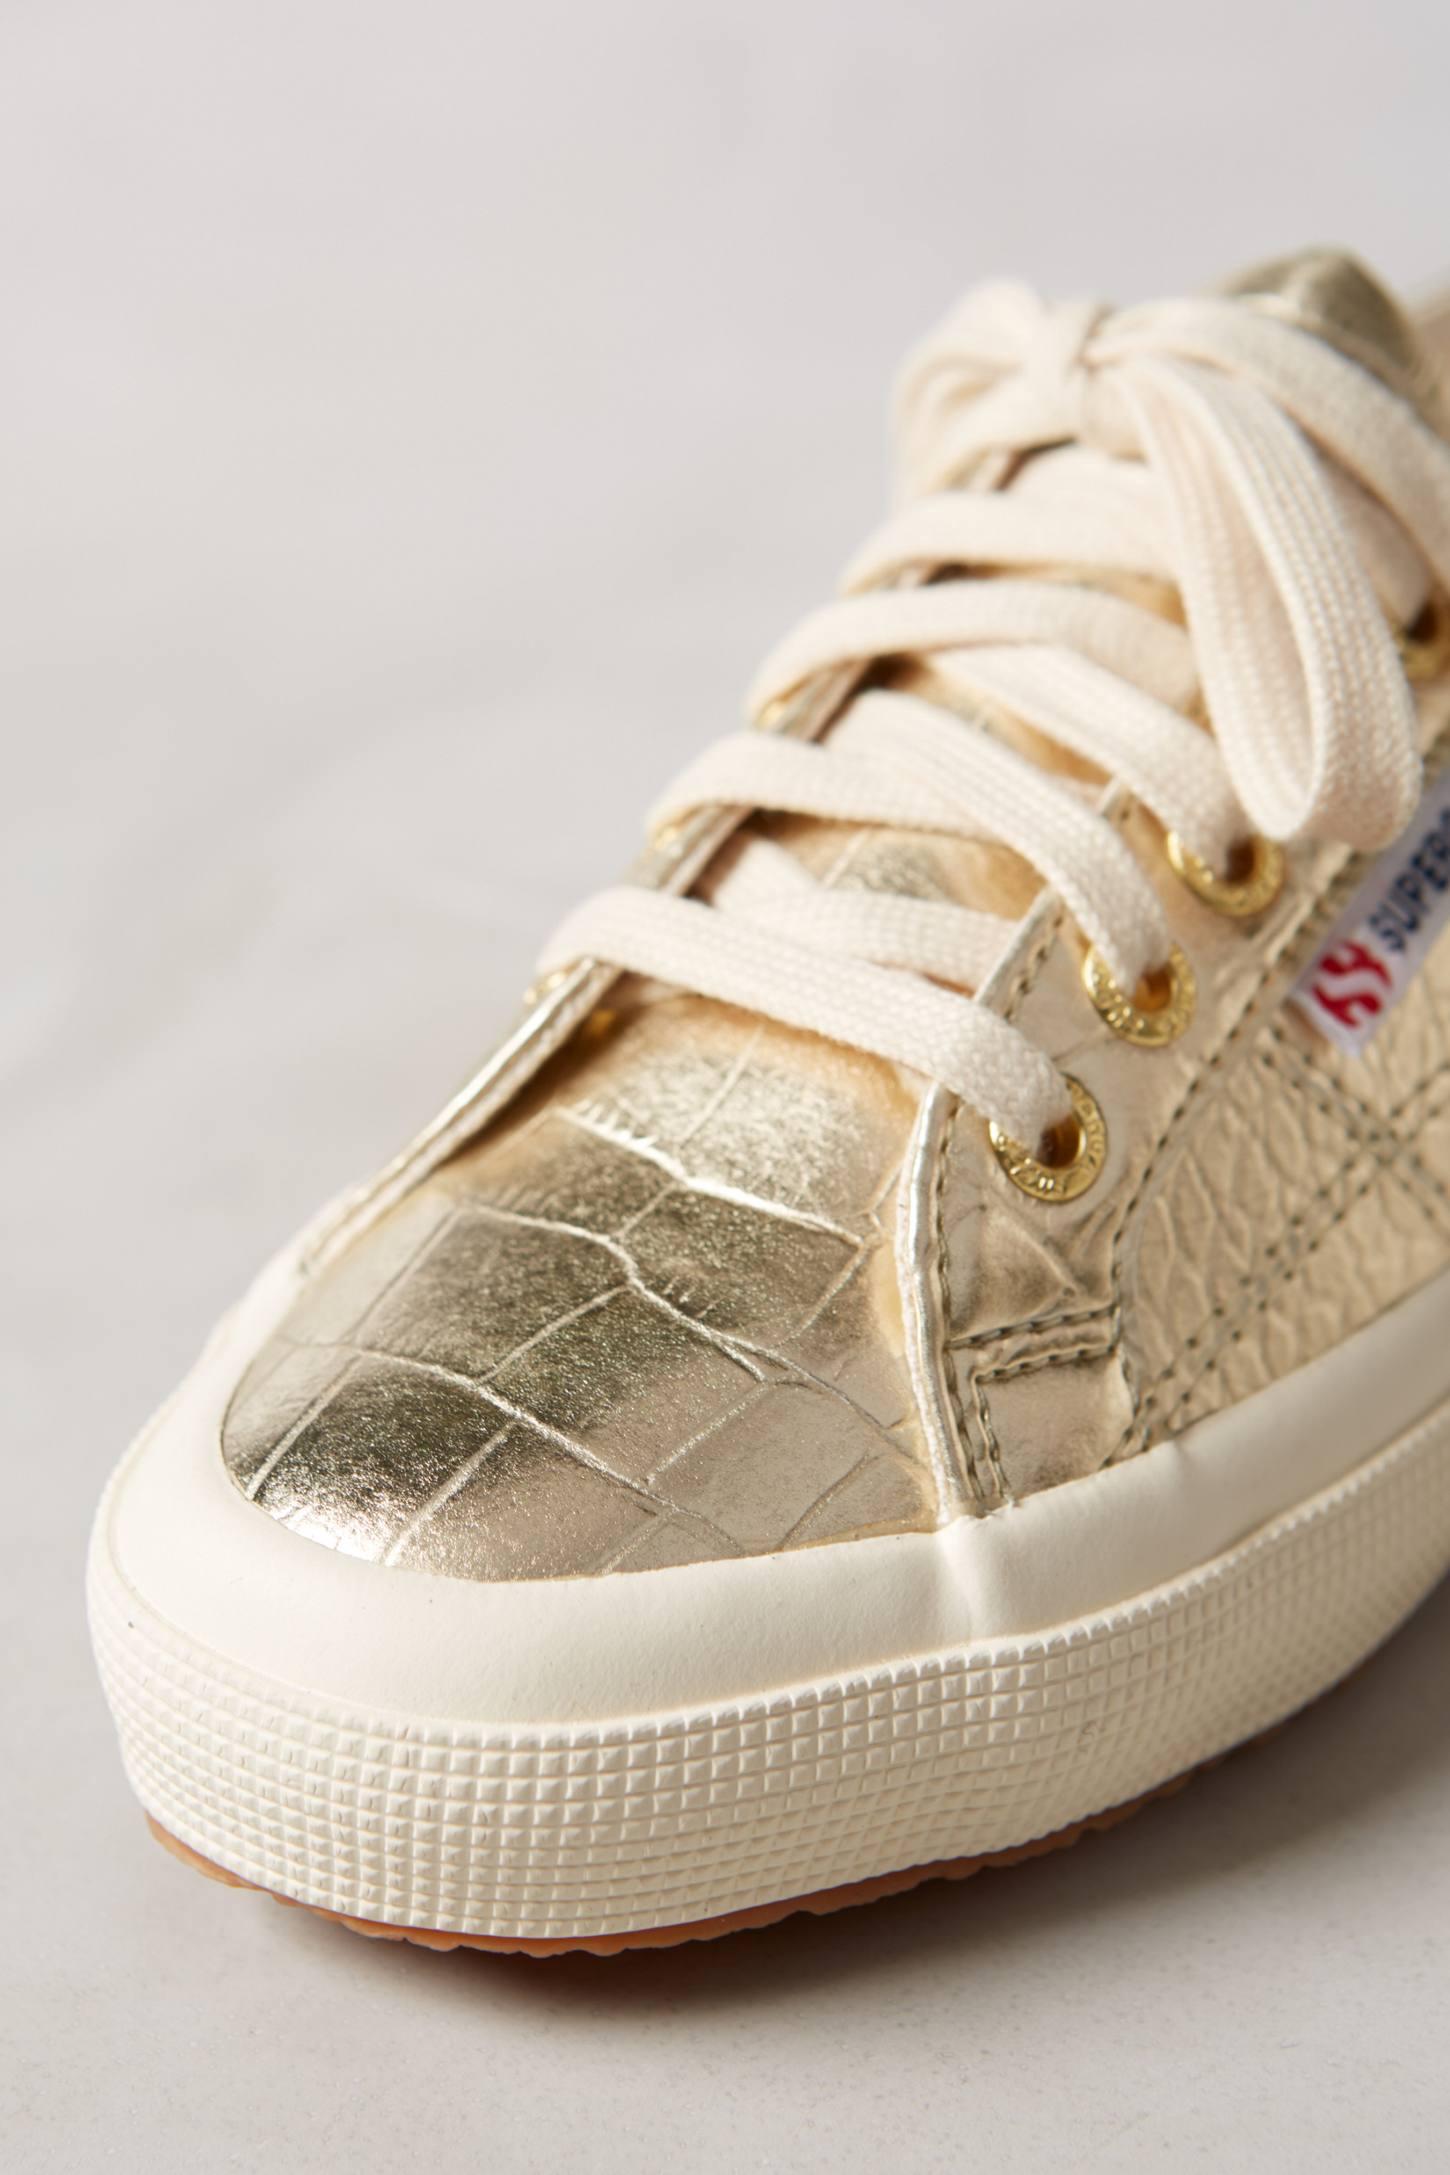 Superga: Superga Metallic Sneakers In Metallic